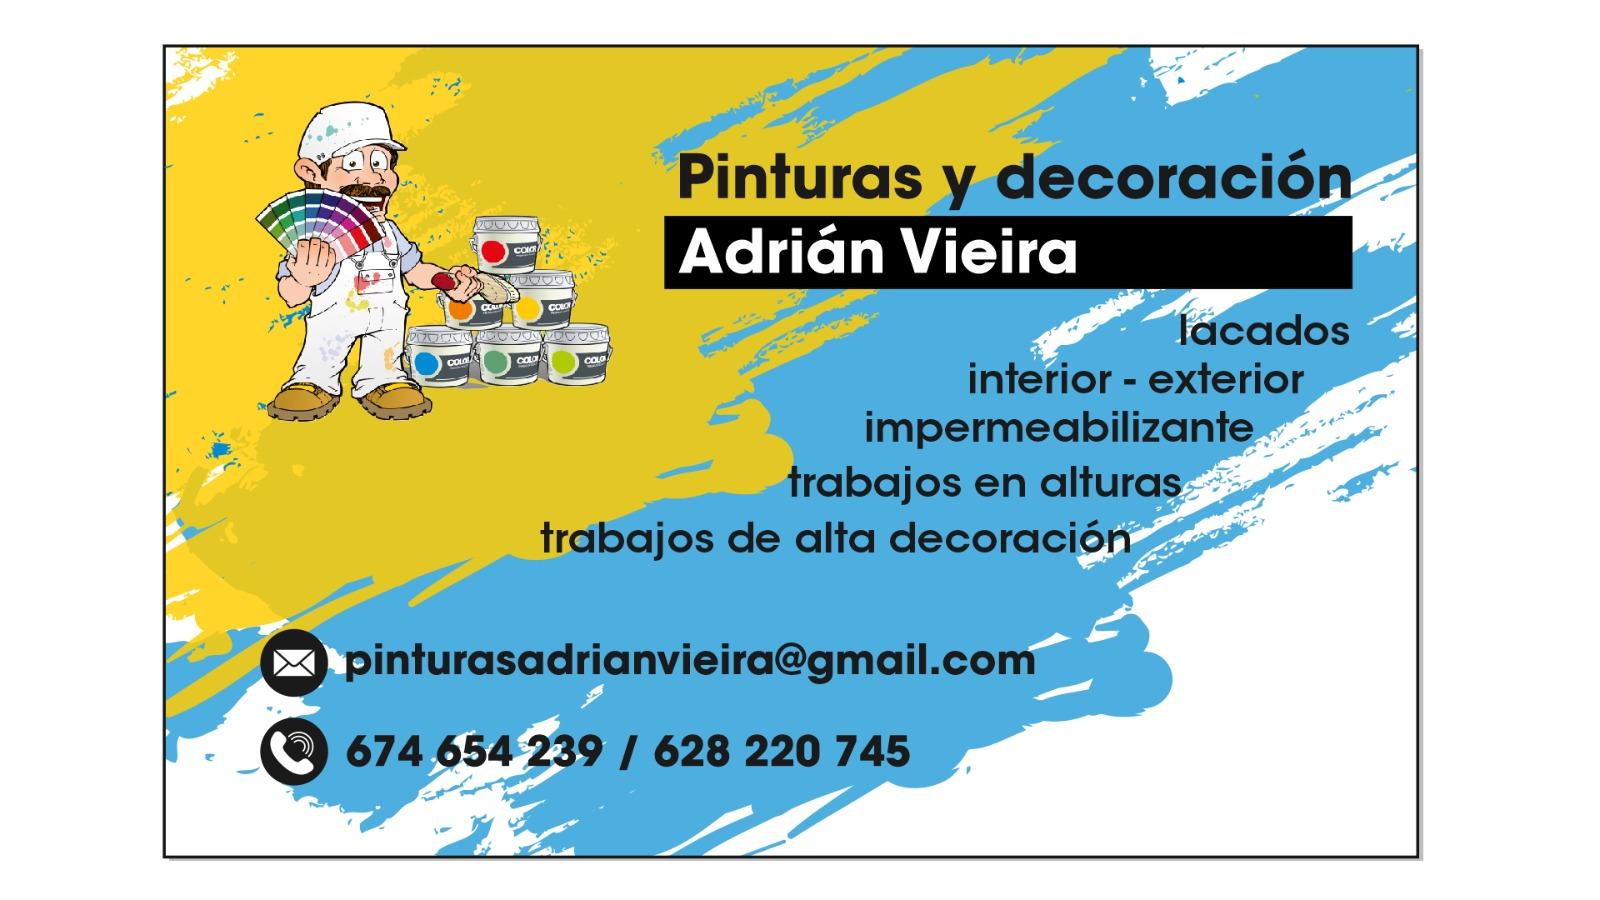 Pinturas Adrian Vieira